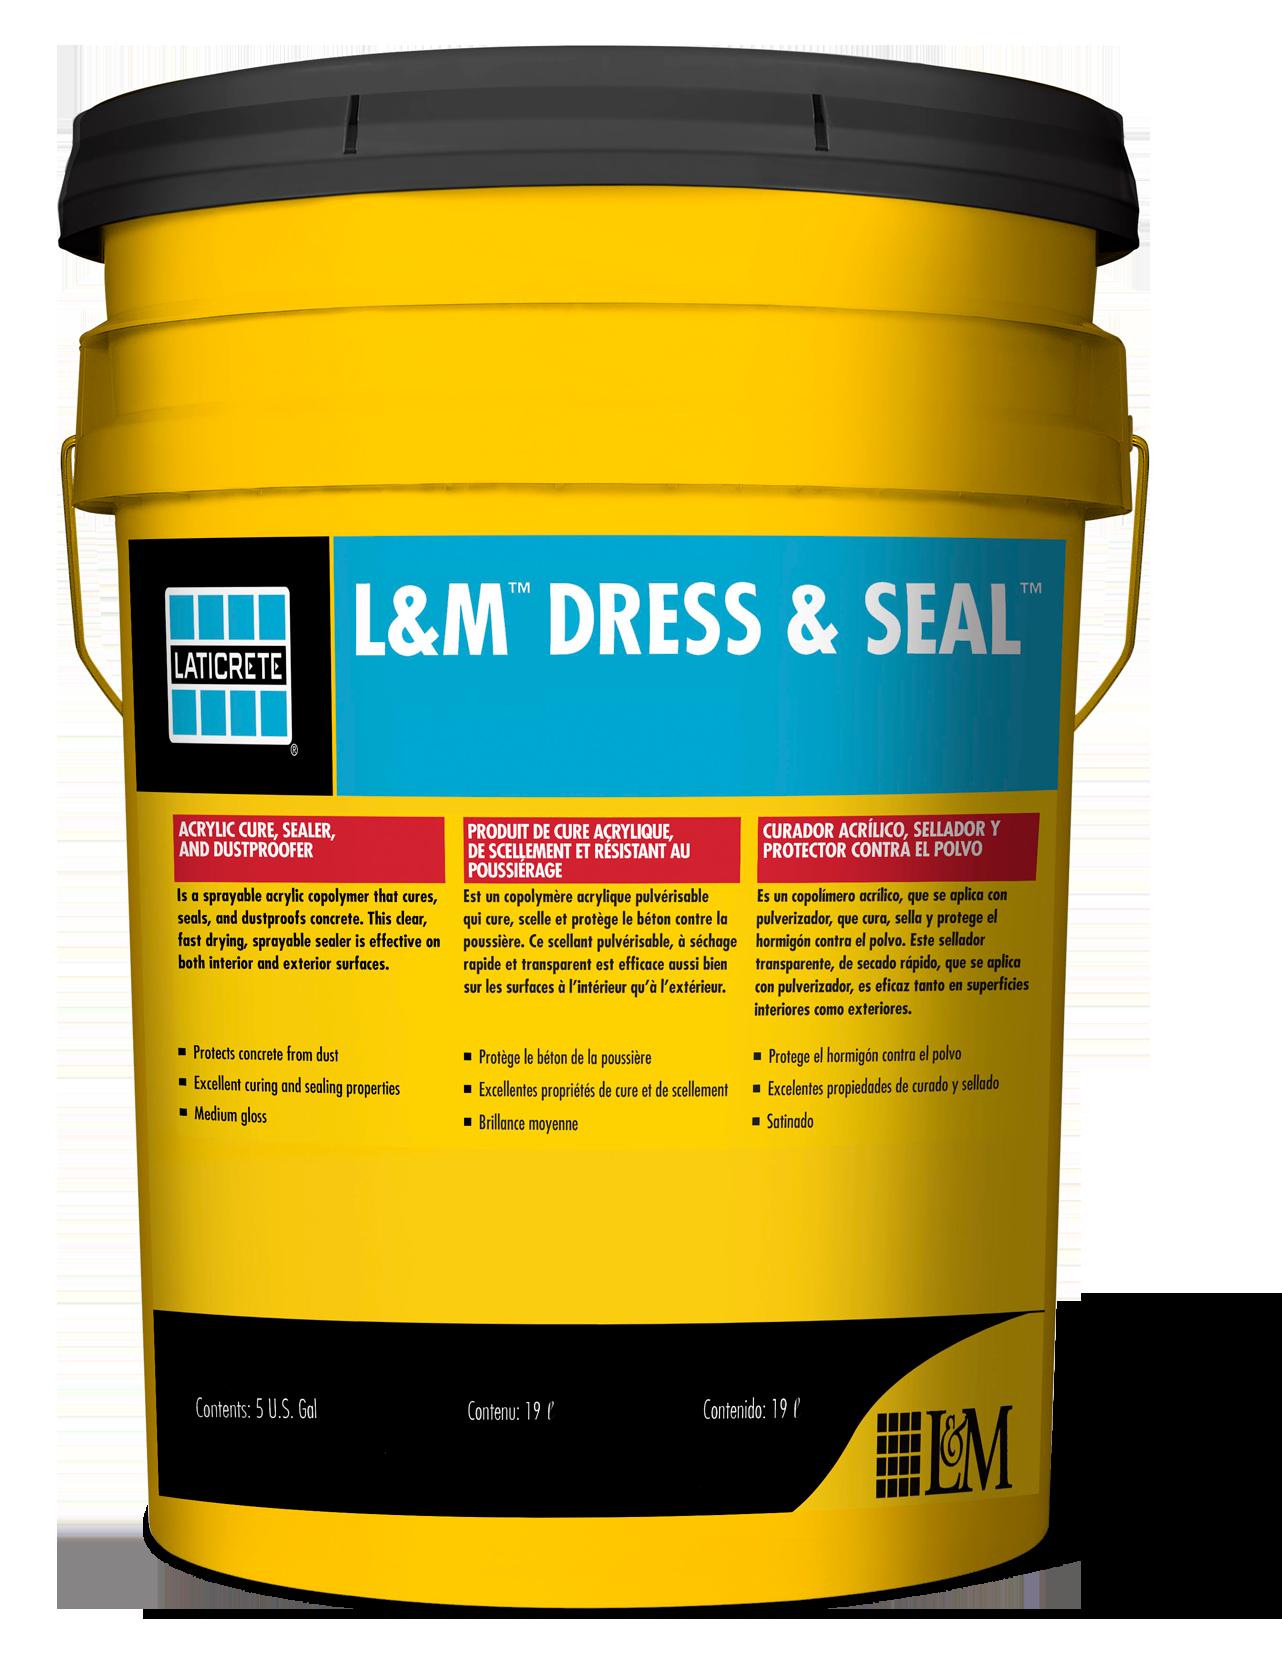 Dress & Seal